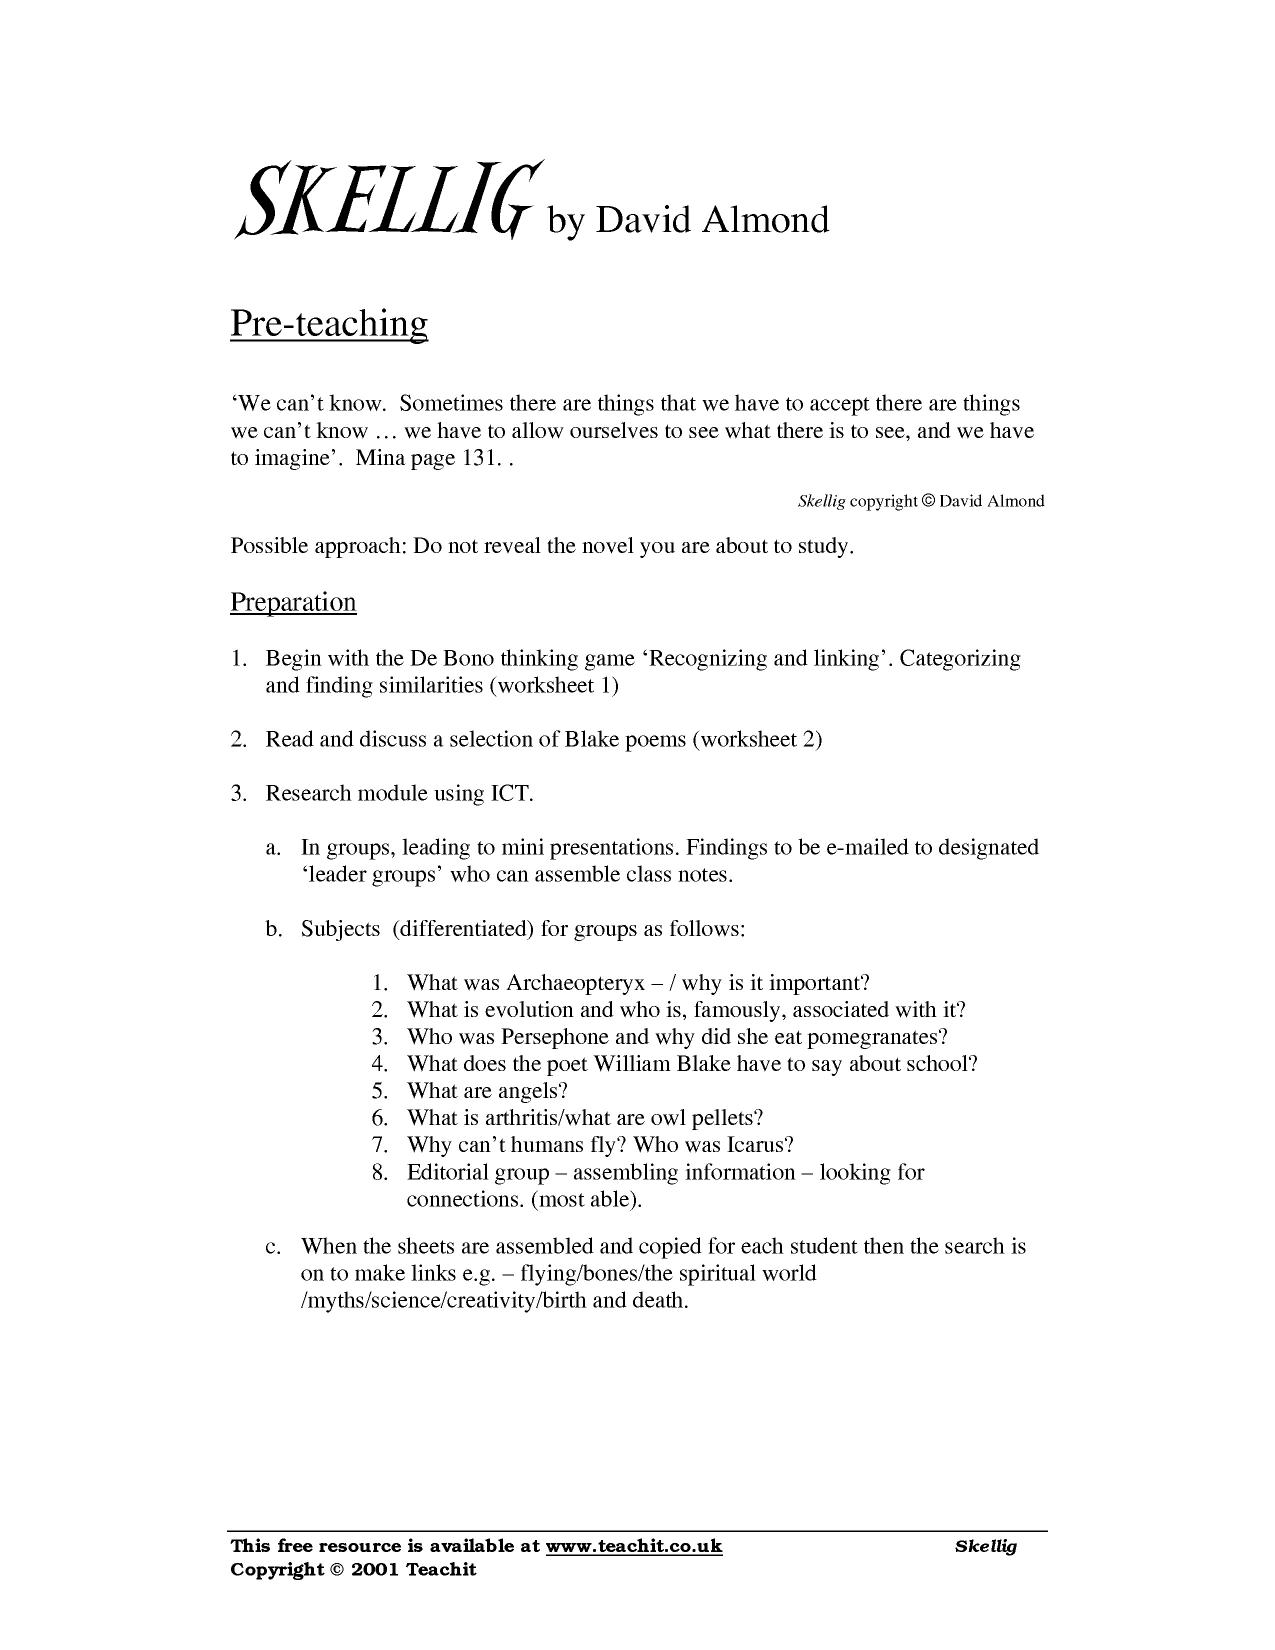 Worksheets The Pigman Worksheets ks3 prose skellig by david almond teachit english 5 preview